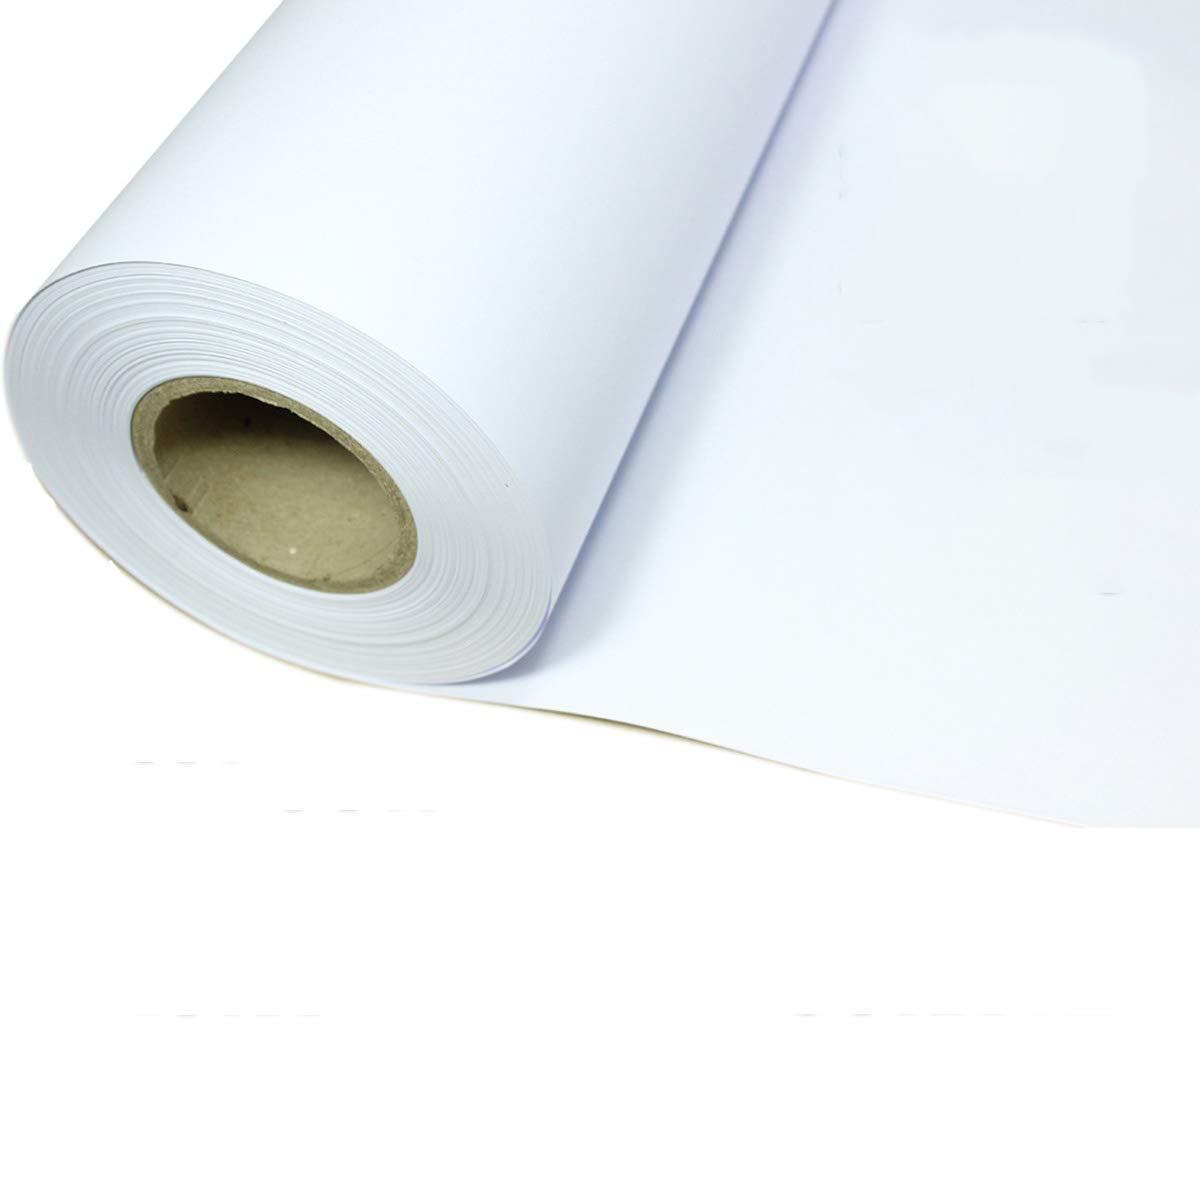 MILAYA JI Bin Shop A0A1A2 Carrete De Ingeniería Papel De Copia Dibujo Blanco CAD Dibujo Papel 1270/1070/880/620 / 450mm  50m ++ (Diseño : A1)